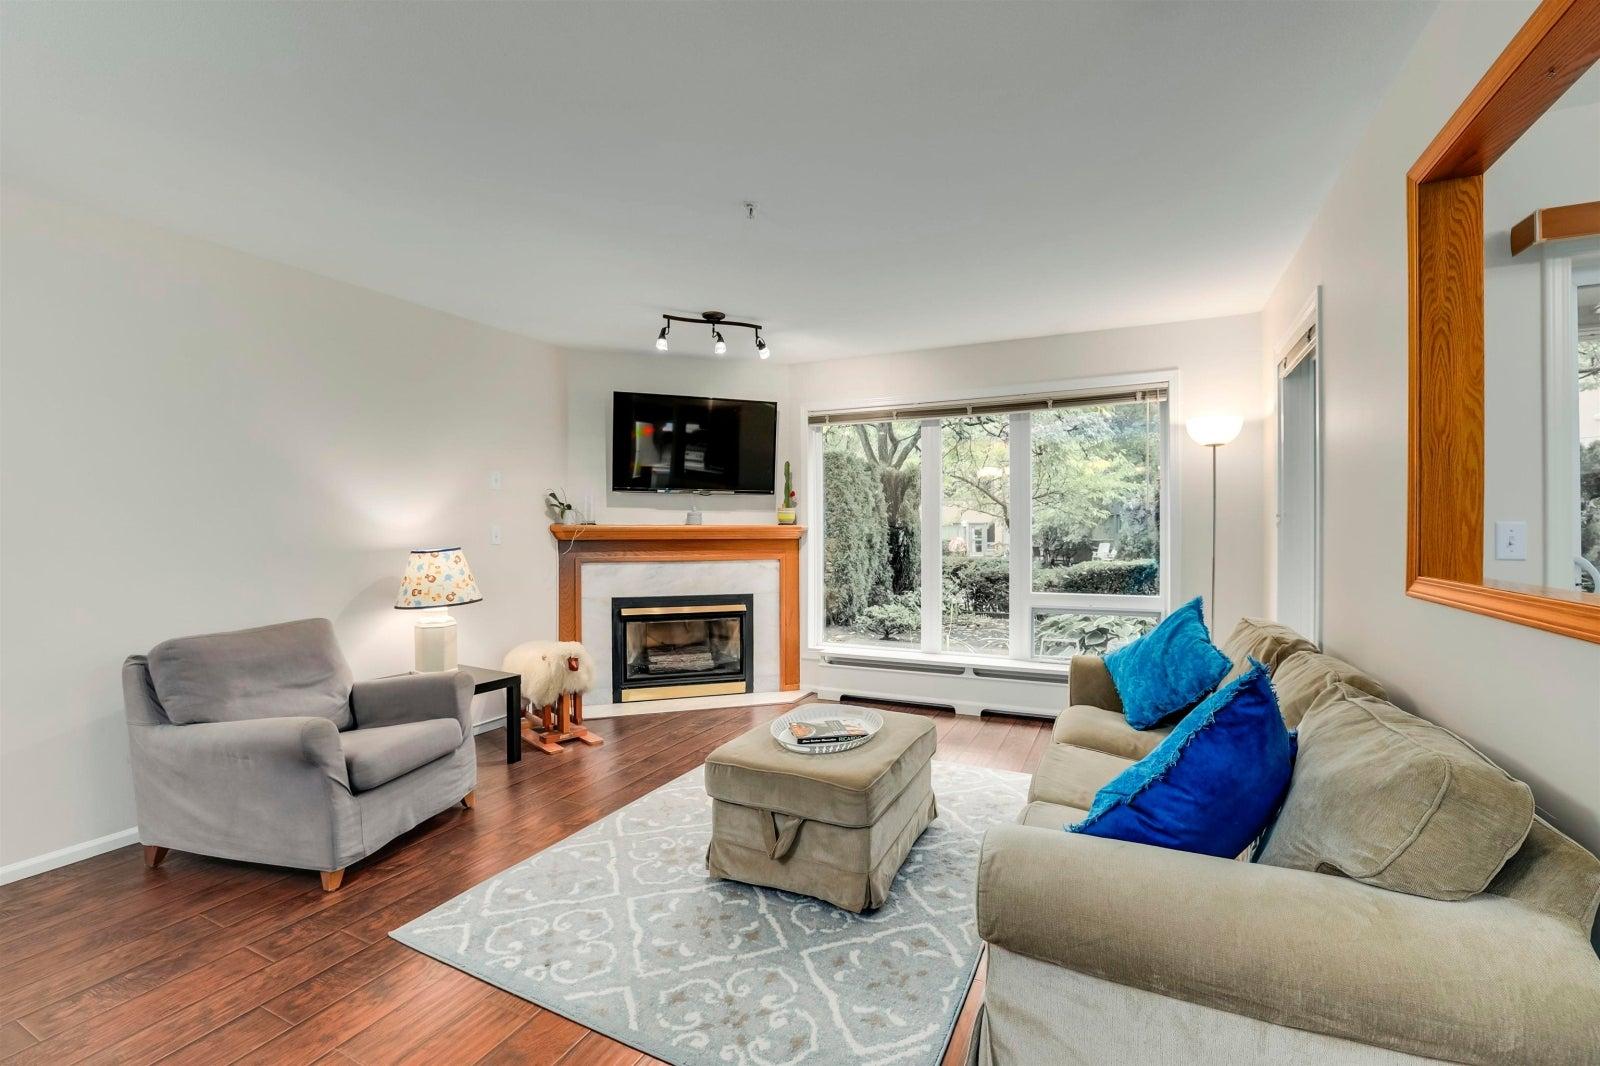 103 1132 DUFFERIN STREET - Eagle Ridge CQ Apartment/Condo for sale, 2 Bedrooms (R2618654) #3